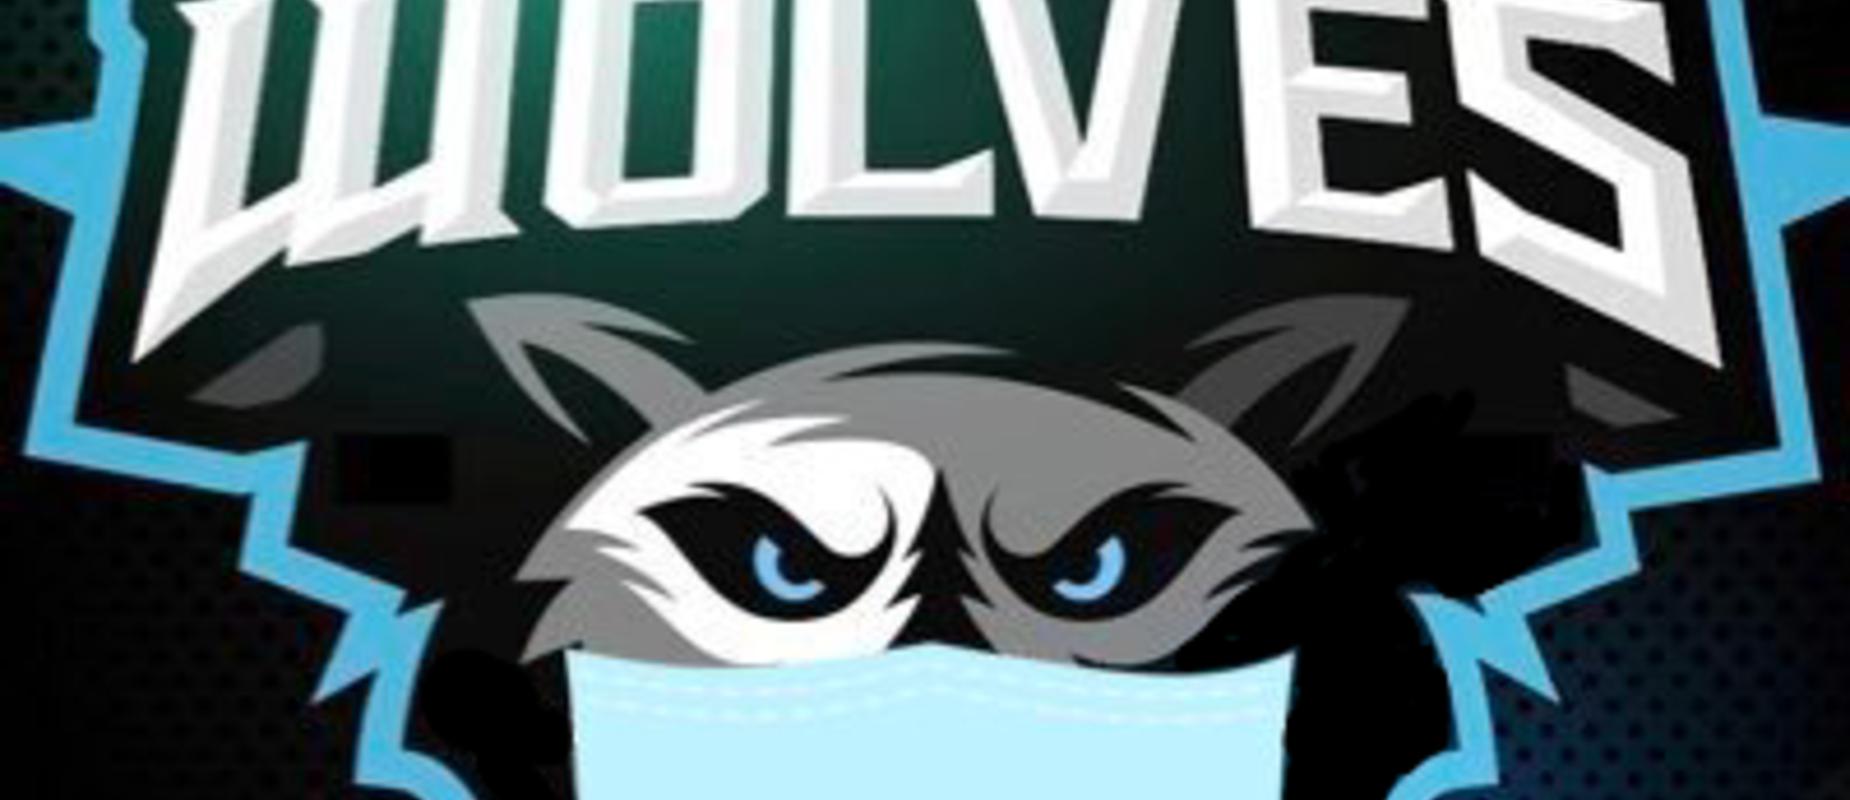 Melrose Wolf